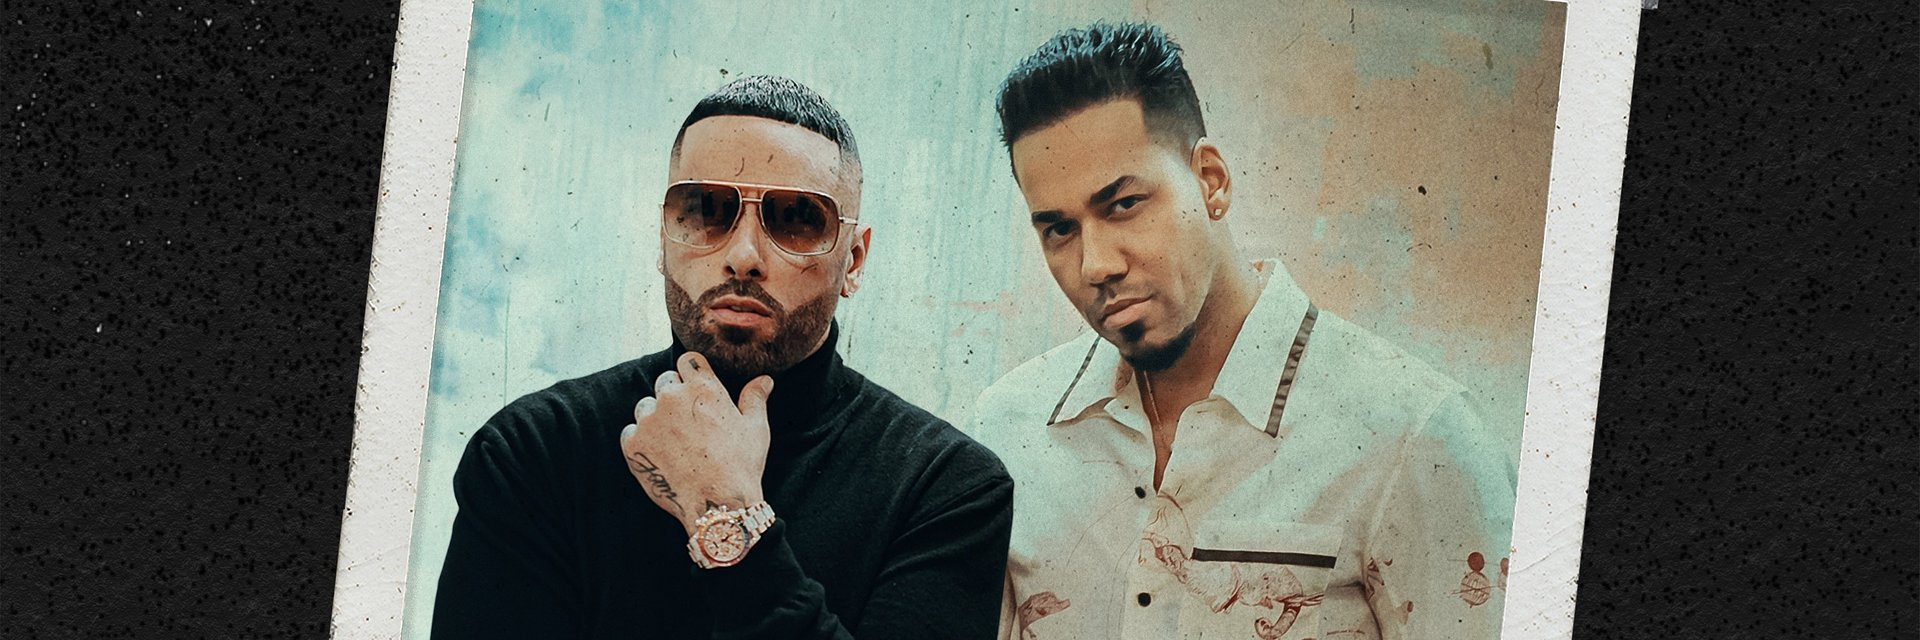 "Nicky Jam oraz Romeo Santos łączą siły w singlu ""Fan De Tus Fotos"""